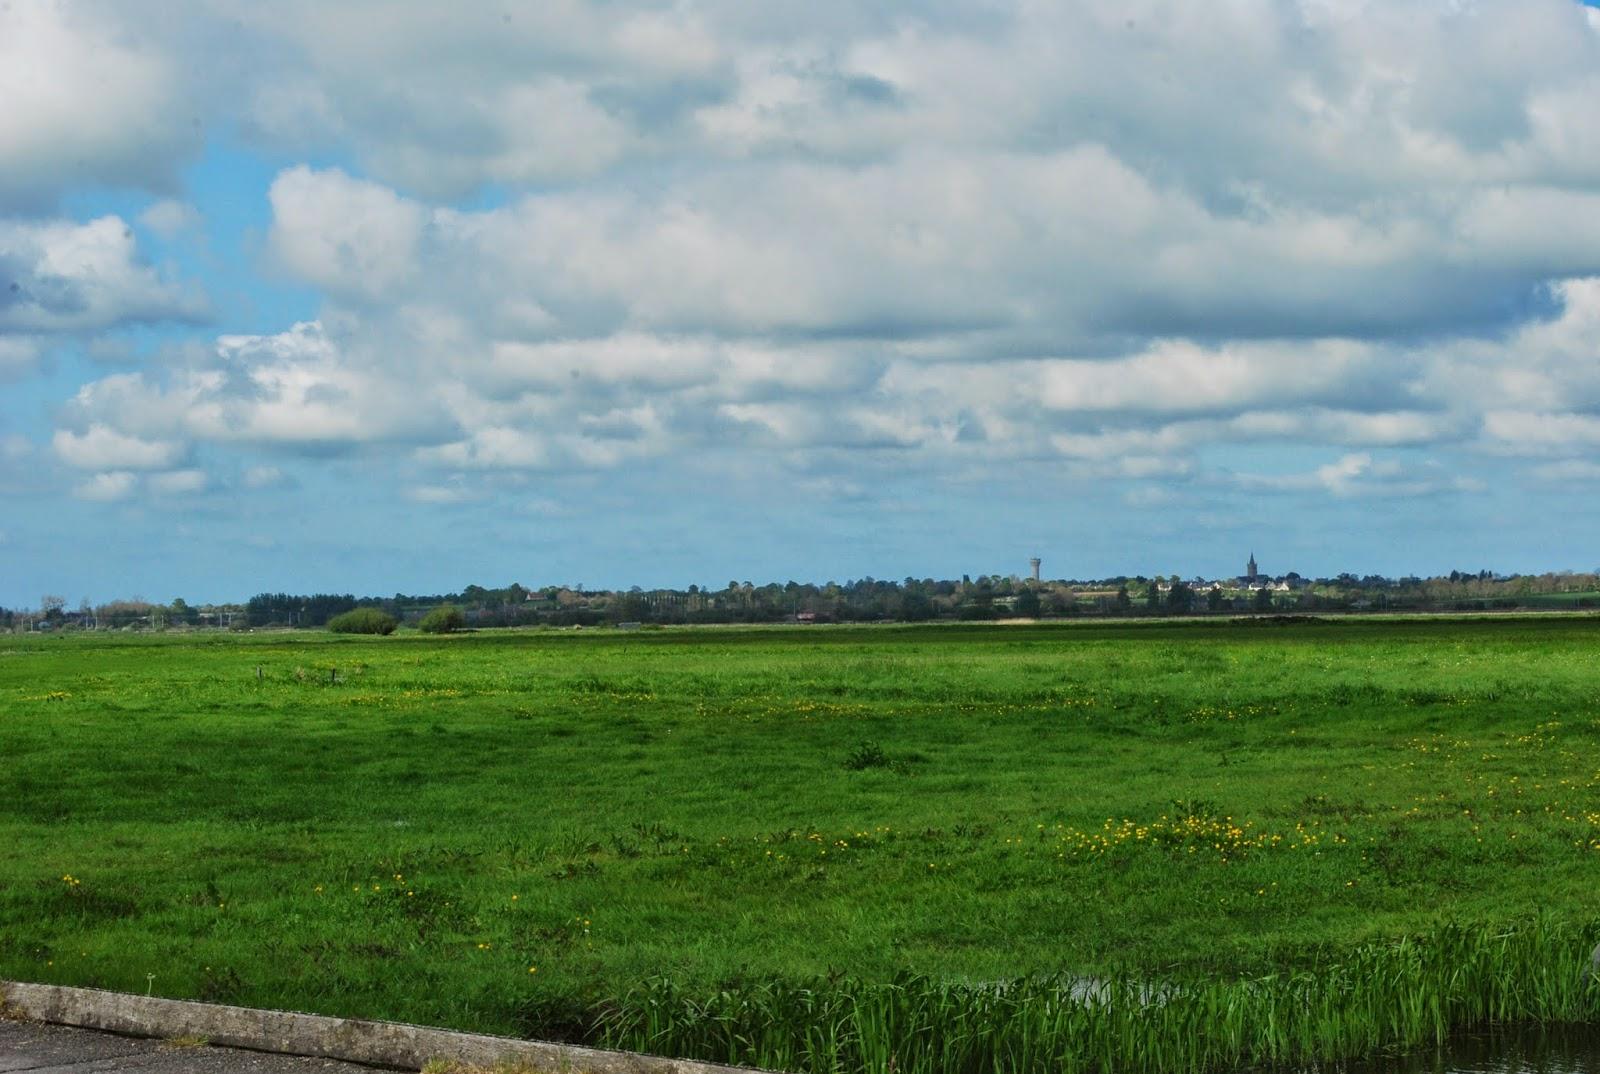 paysage campagne normande